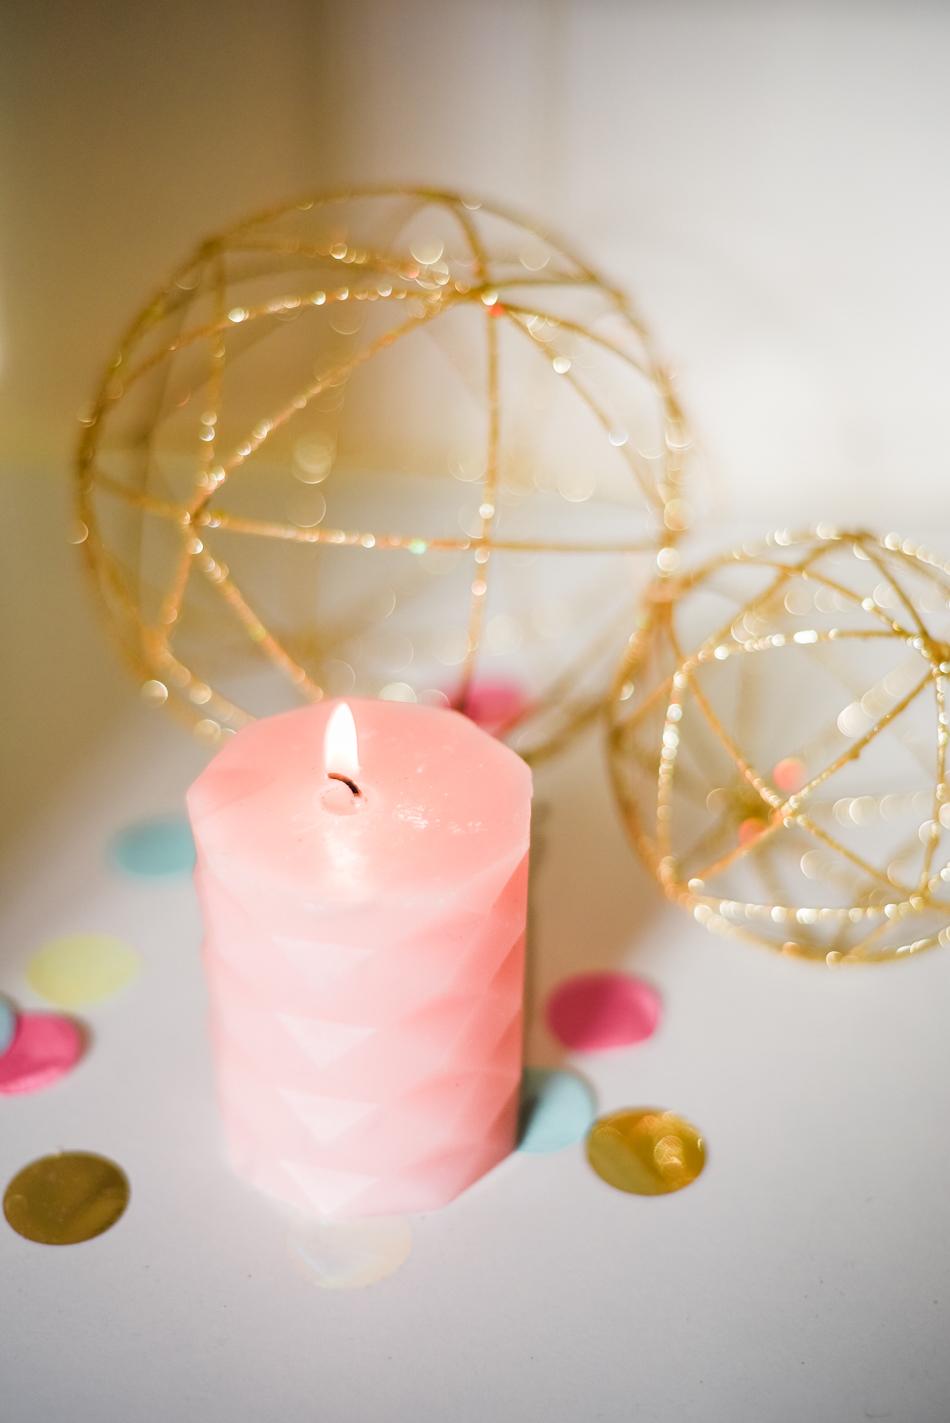 Valentinesday-table-setting-decor-styling-AnaisStoelen-18.jpg